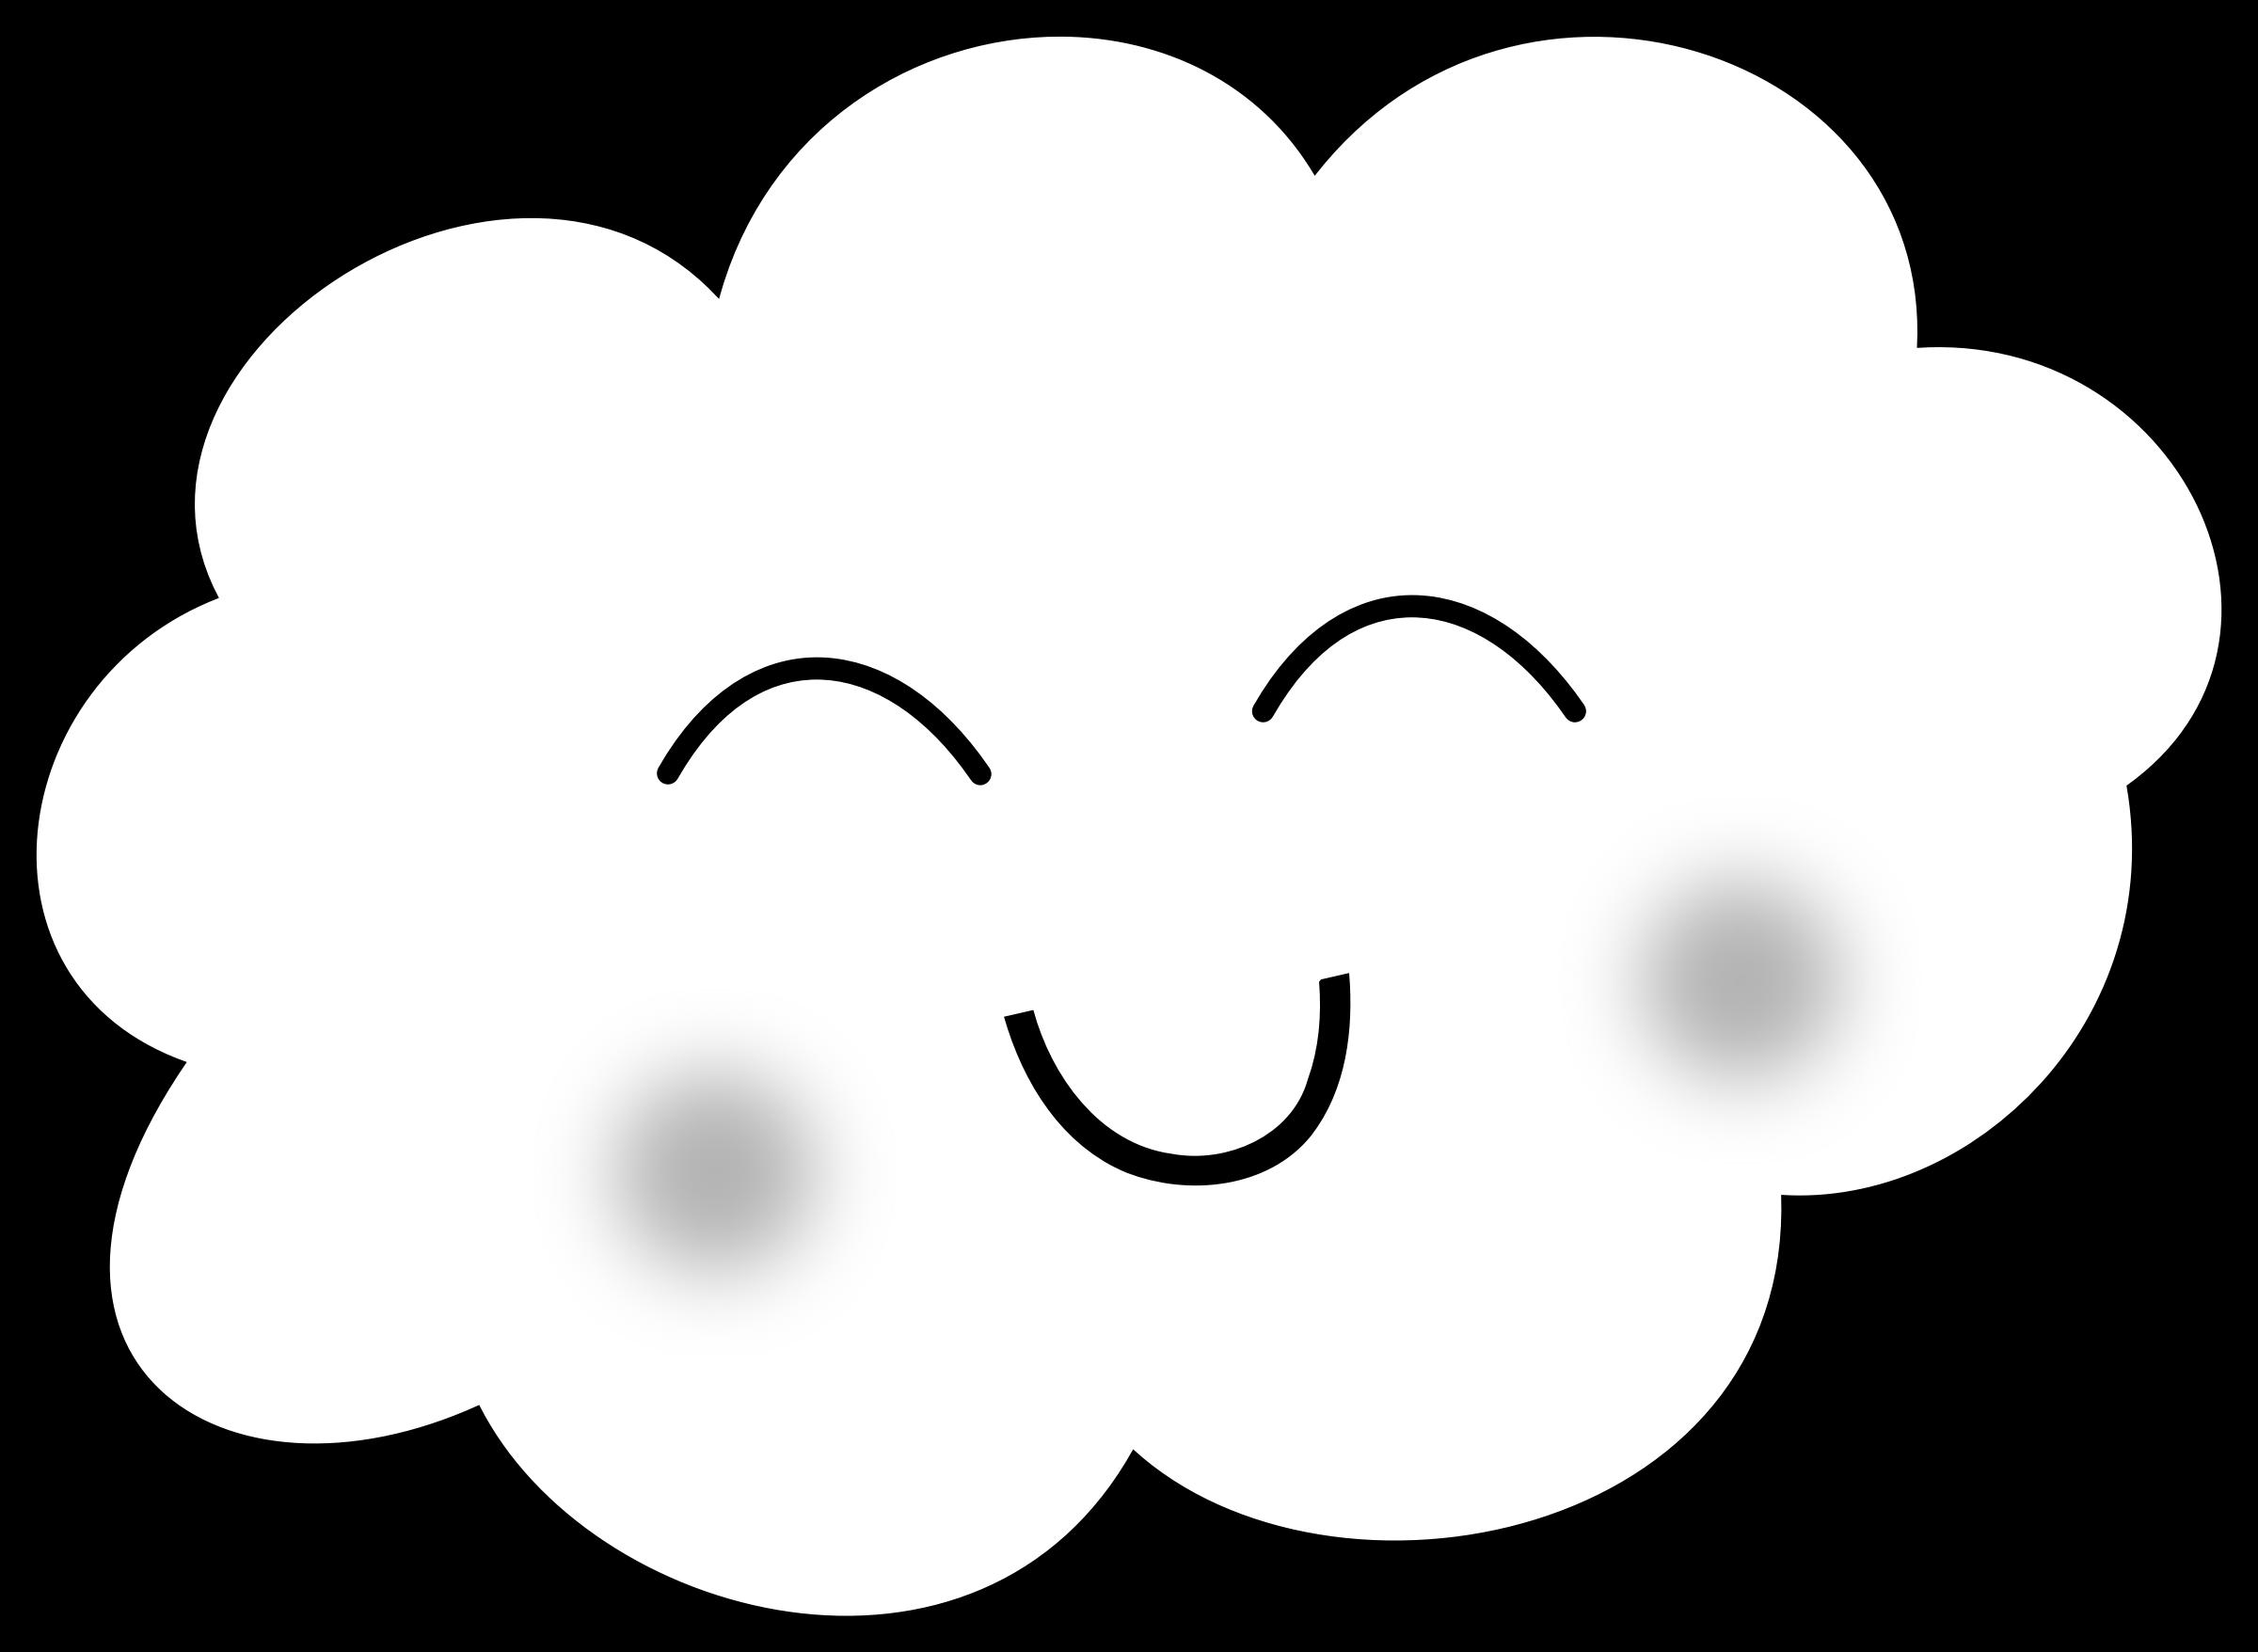 Clouds clipart dream. Happy cloud coloring book